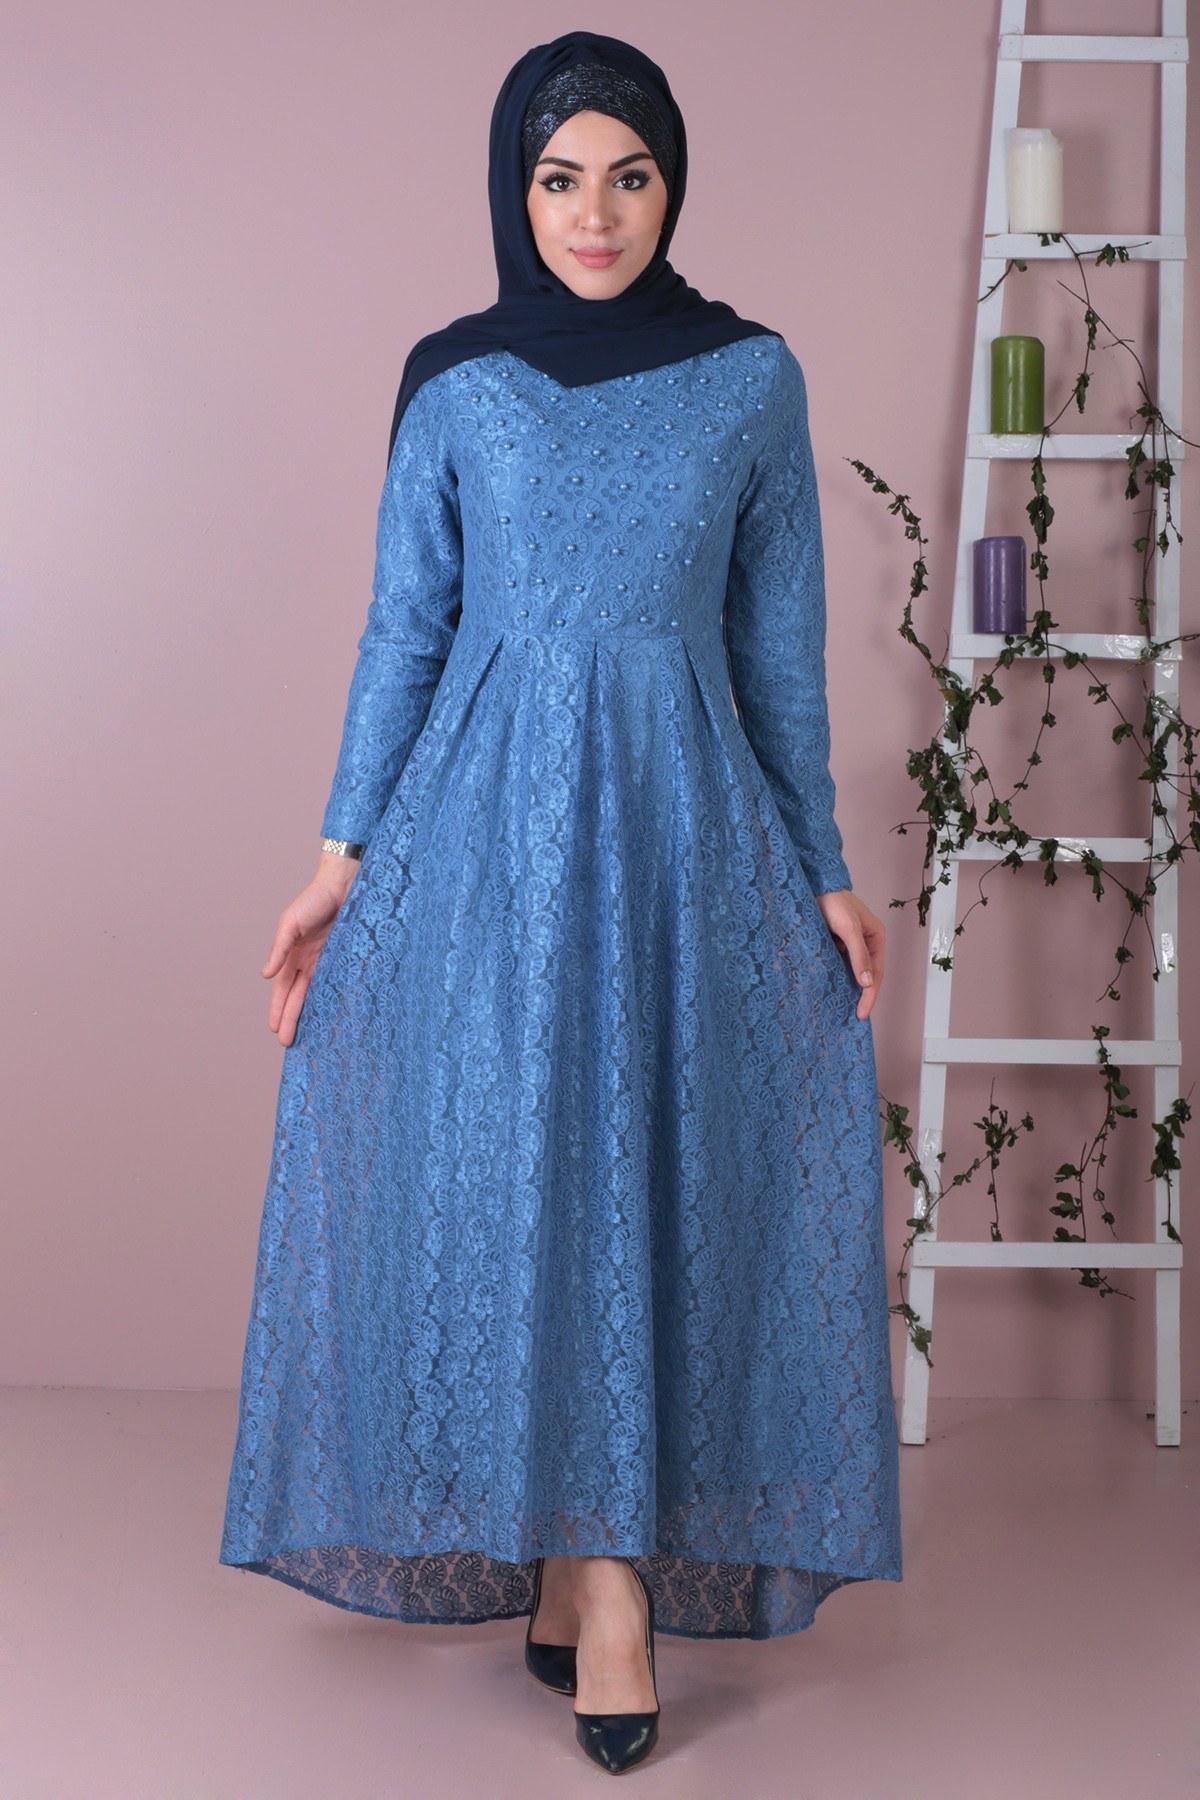 0985a8dd5f06e Tesettür Giyim, Tesettür Elbise, Ferace | Modasena.com